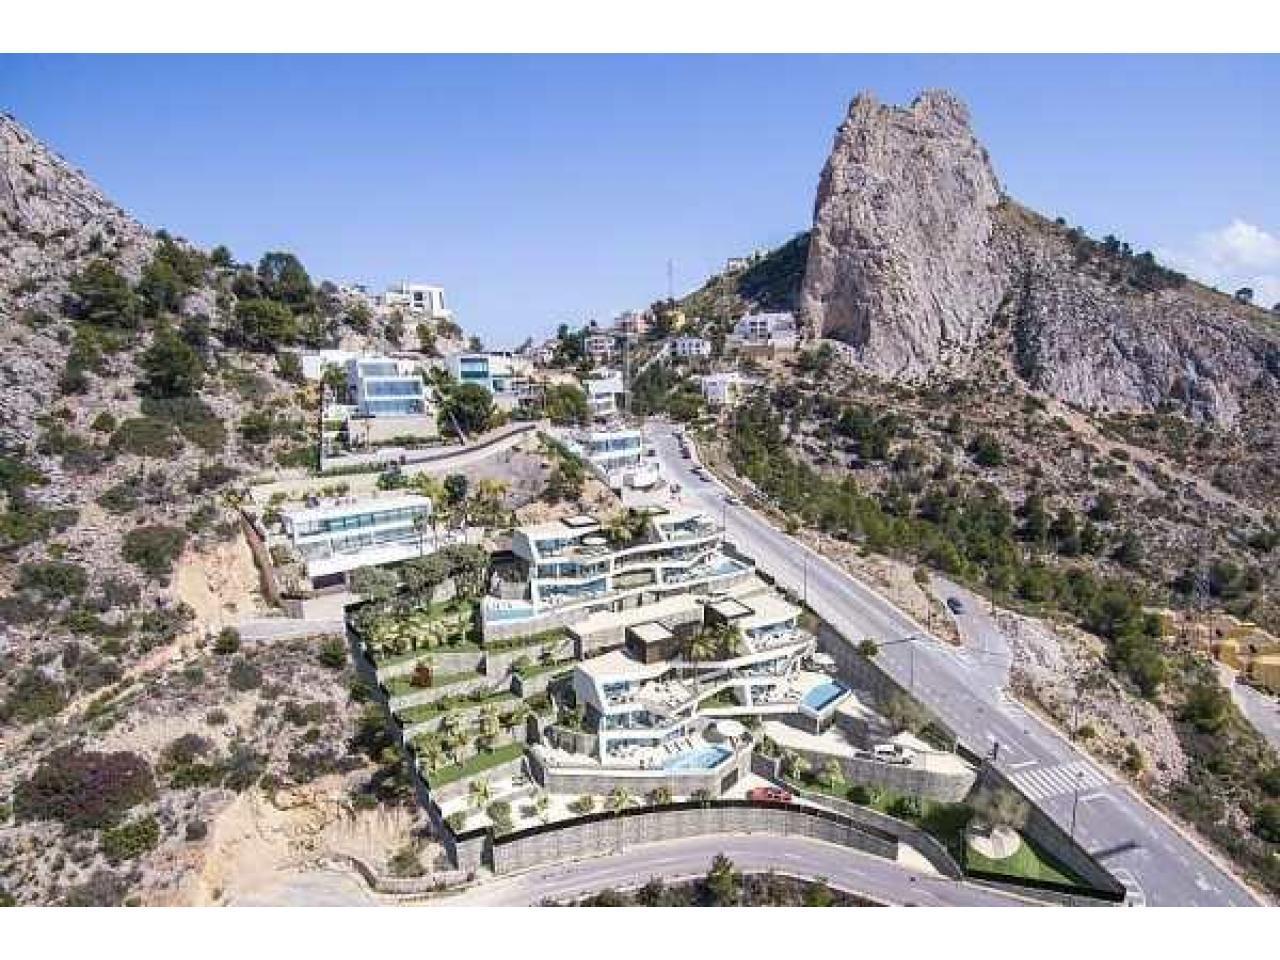 Недвижимость в Испании, Новая вилла с видами на море от застройщика в Альтеа,Коста Бланка,Испания - 4